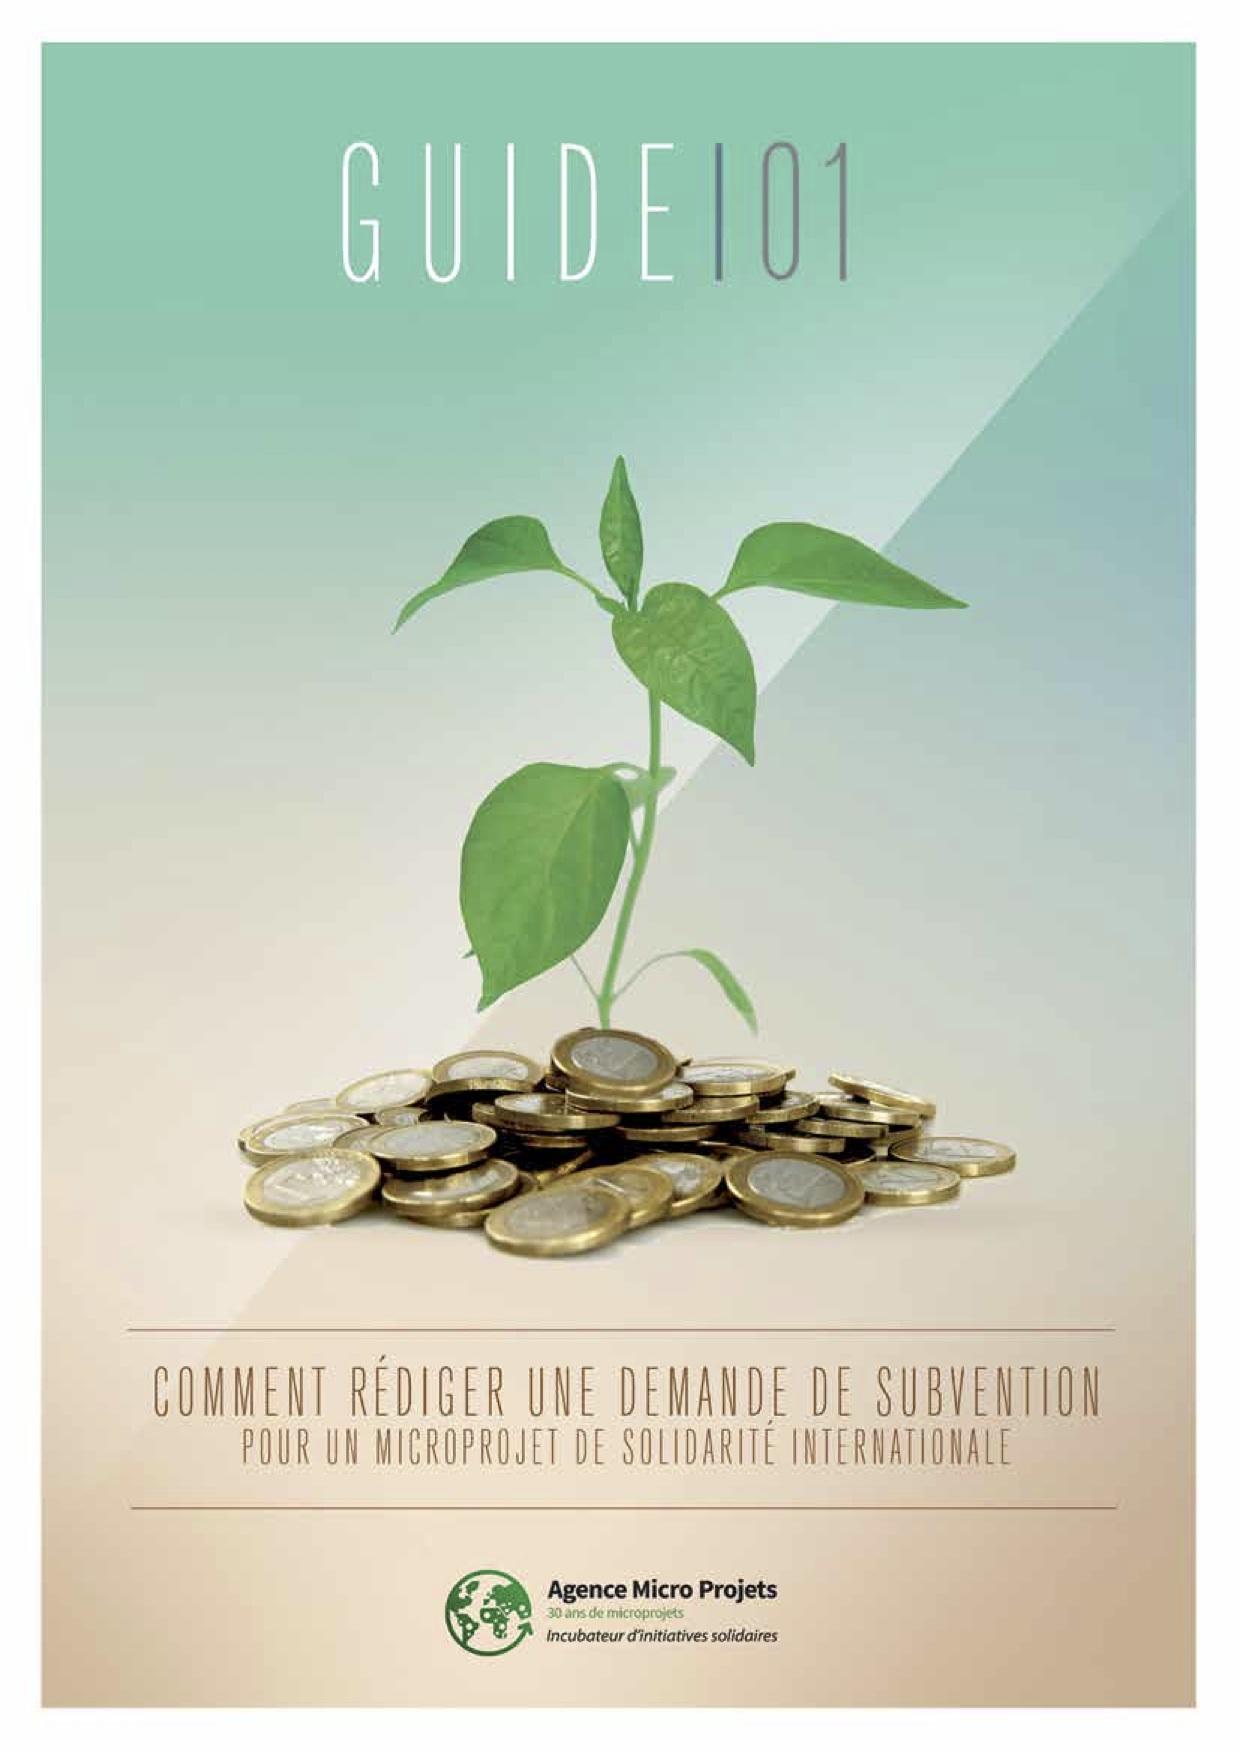 demander une subvention agence microprojet resacoop guide